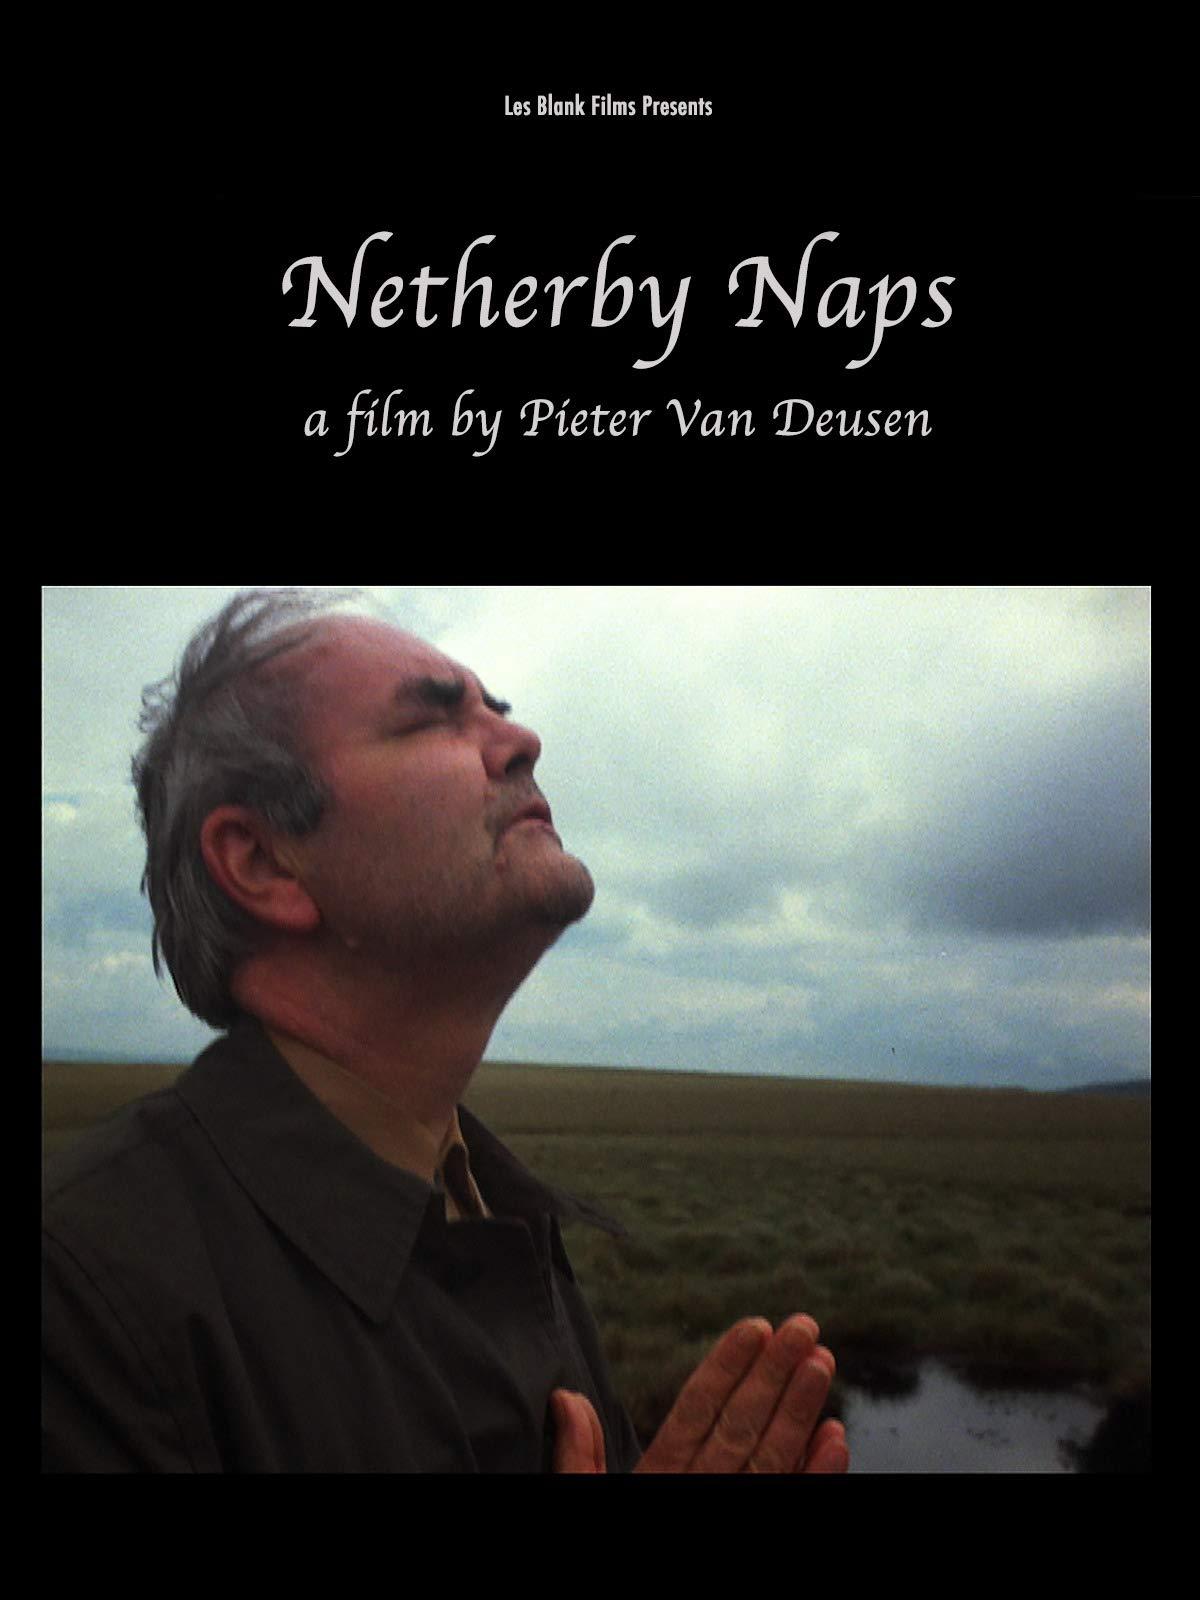 Netherby Naps